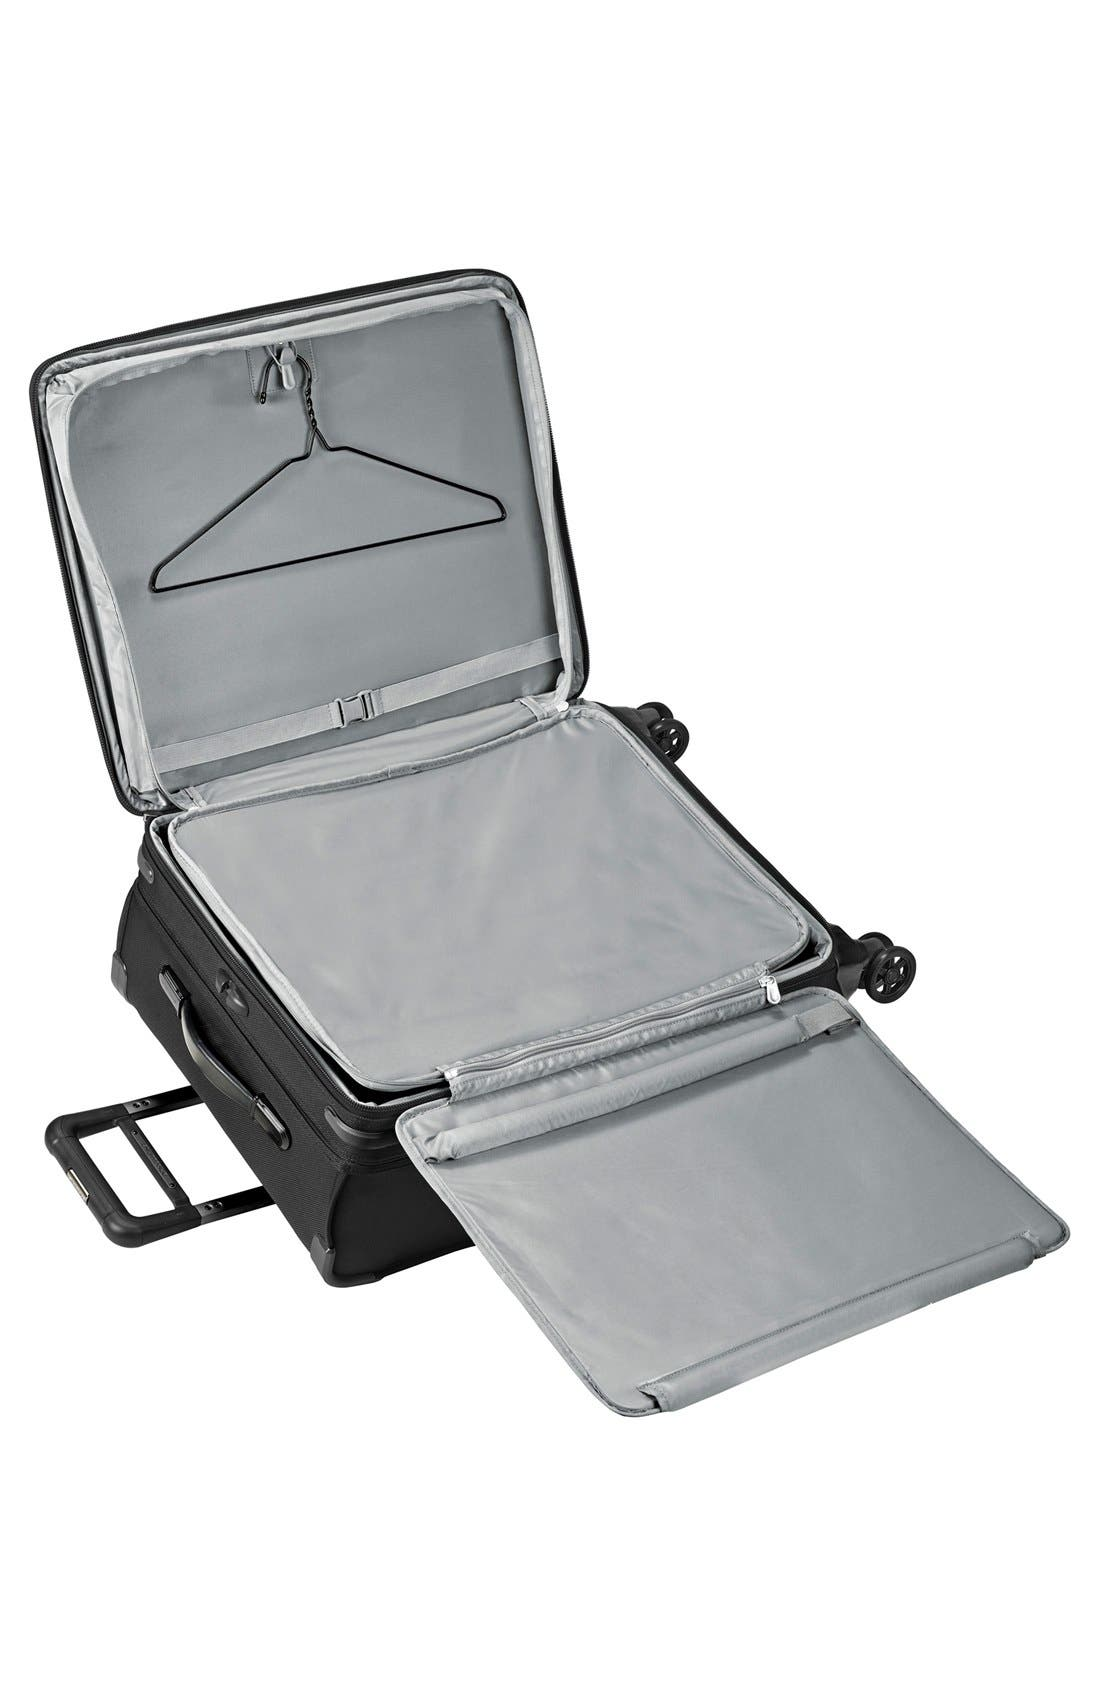 'Baseline' Medium Expandable Rolling Packing Case,                             Alternate thumbnail 3, color,                             Black